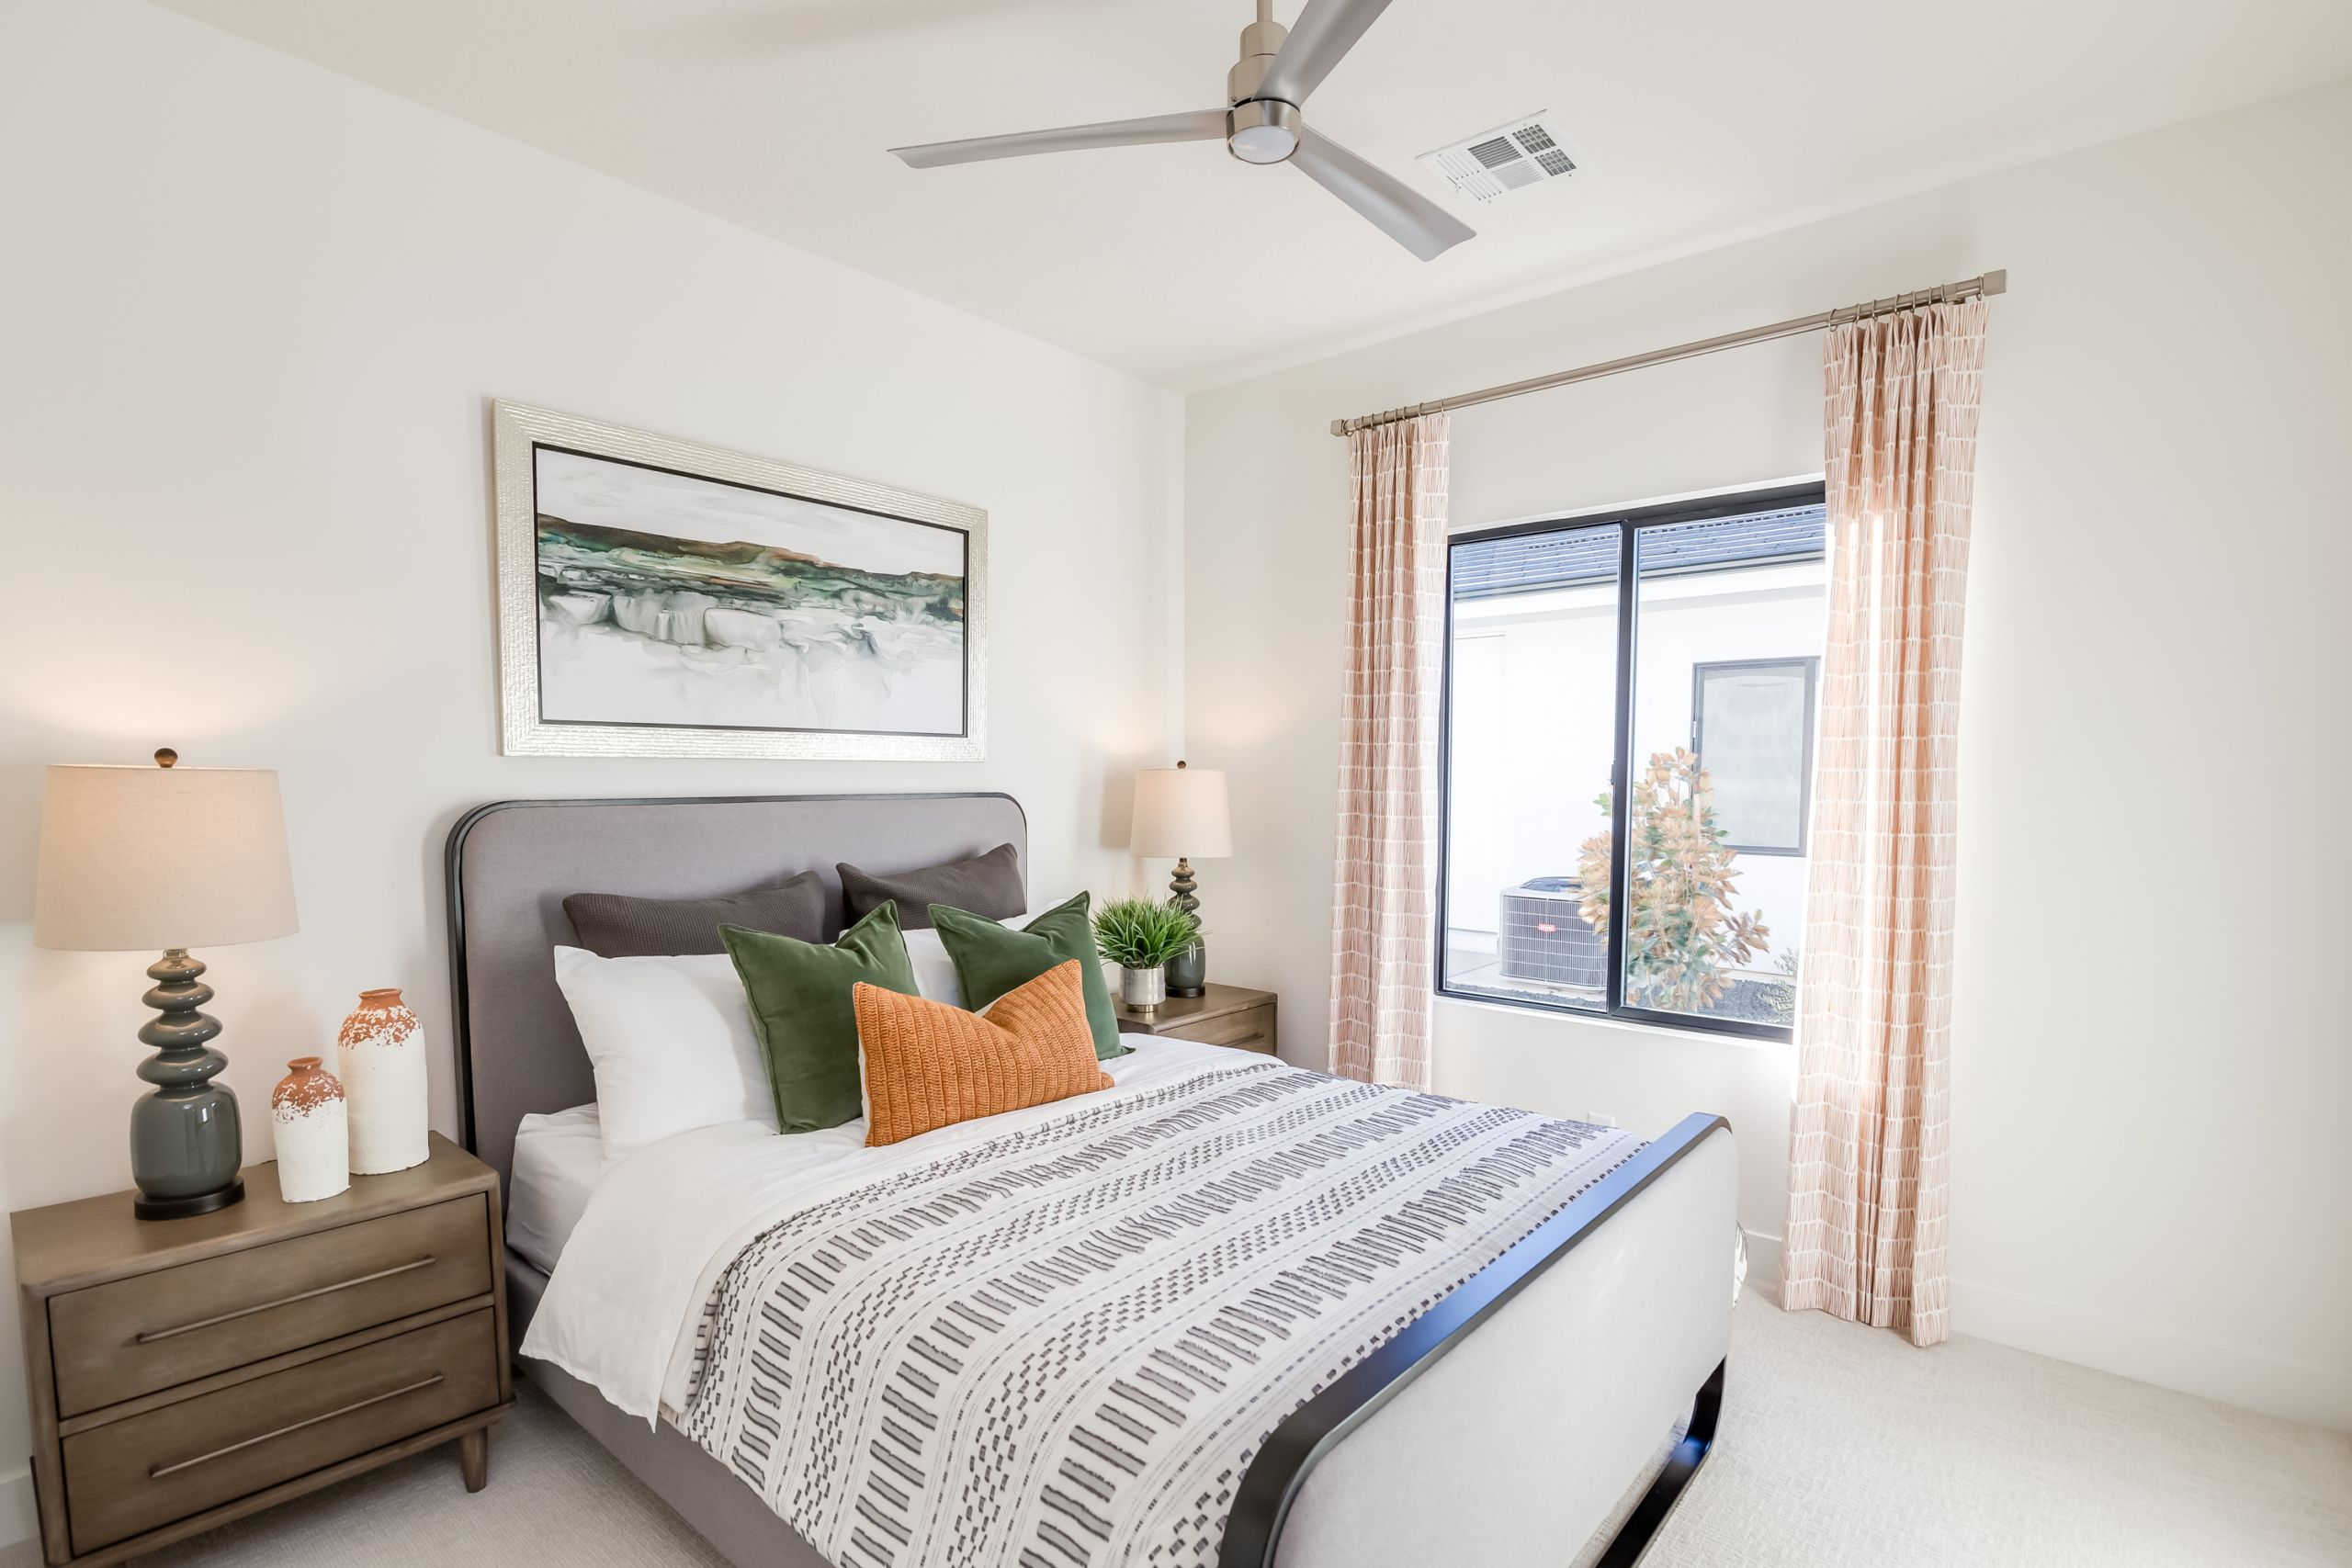 Bedroom featured in the Varano Vistas Plan 2345 By Ence Homes in St. George, UT